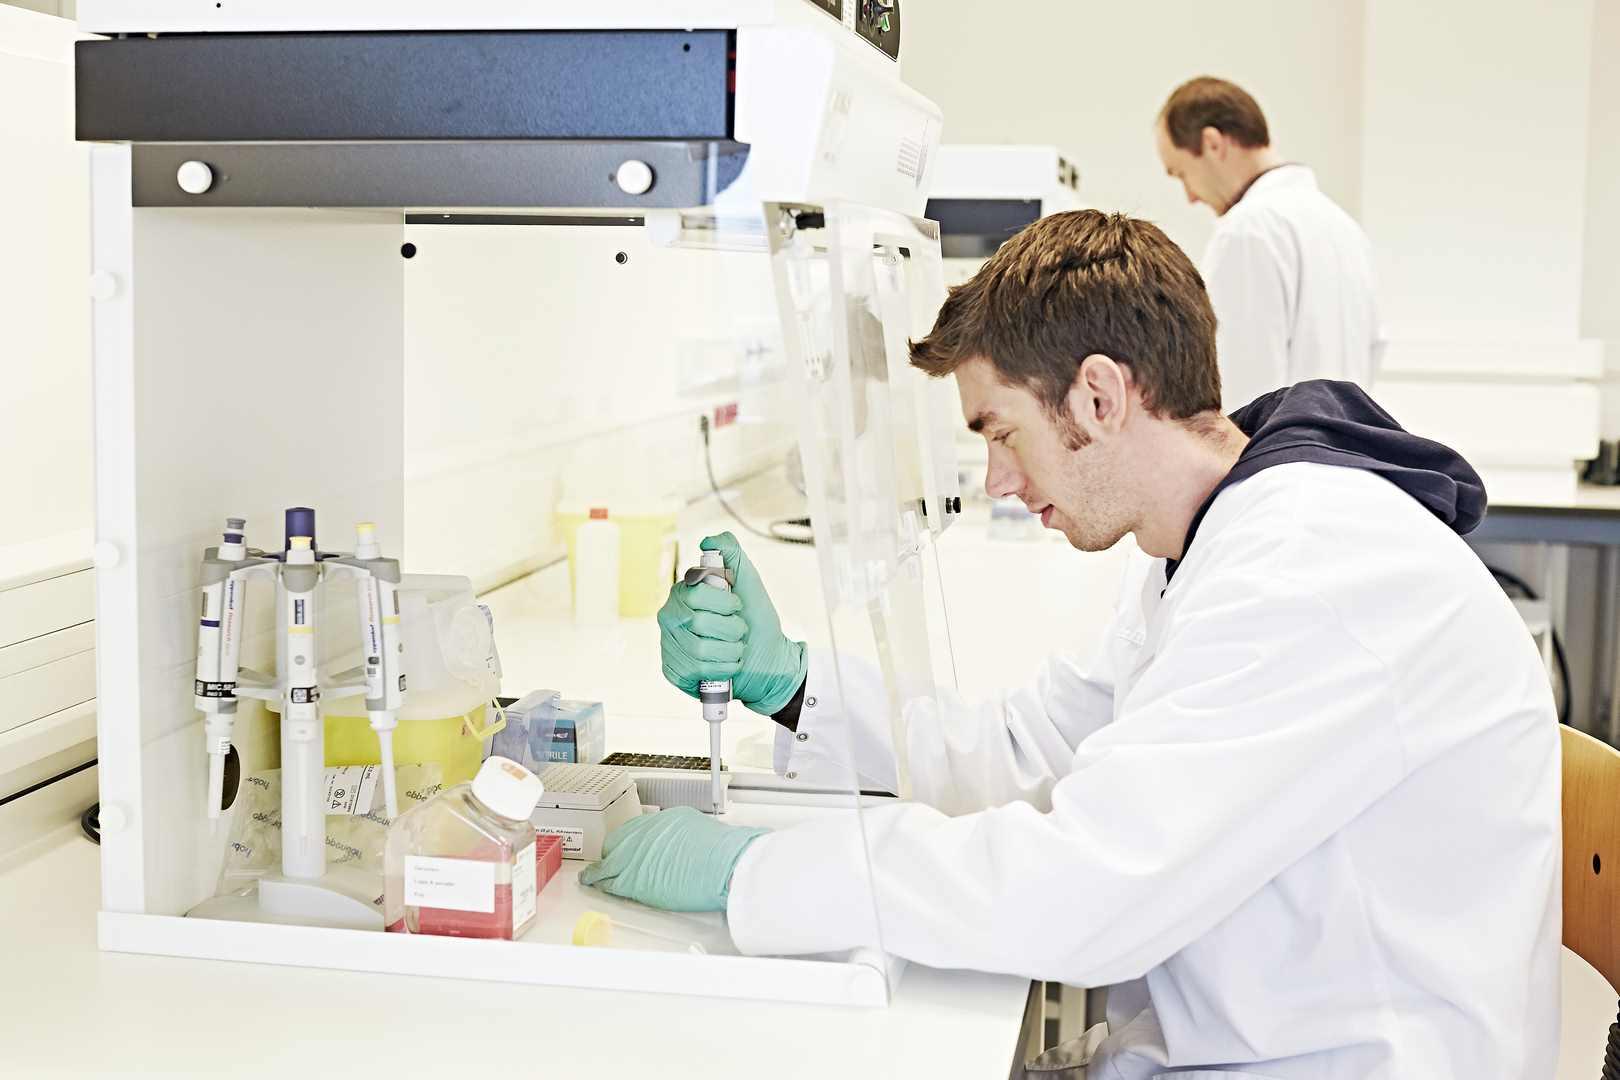 Quality Assistance job scientist biomolecules analysis careers